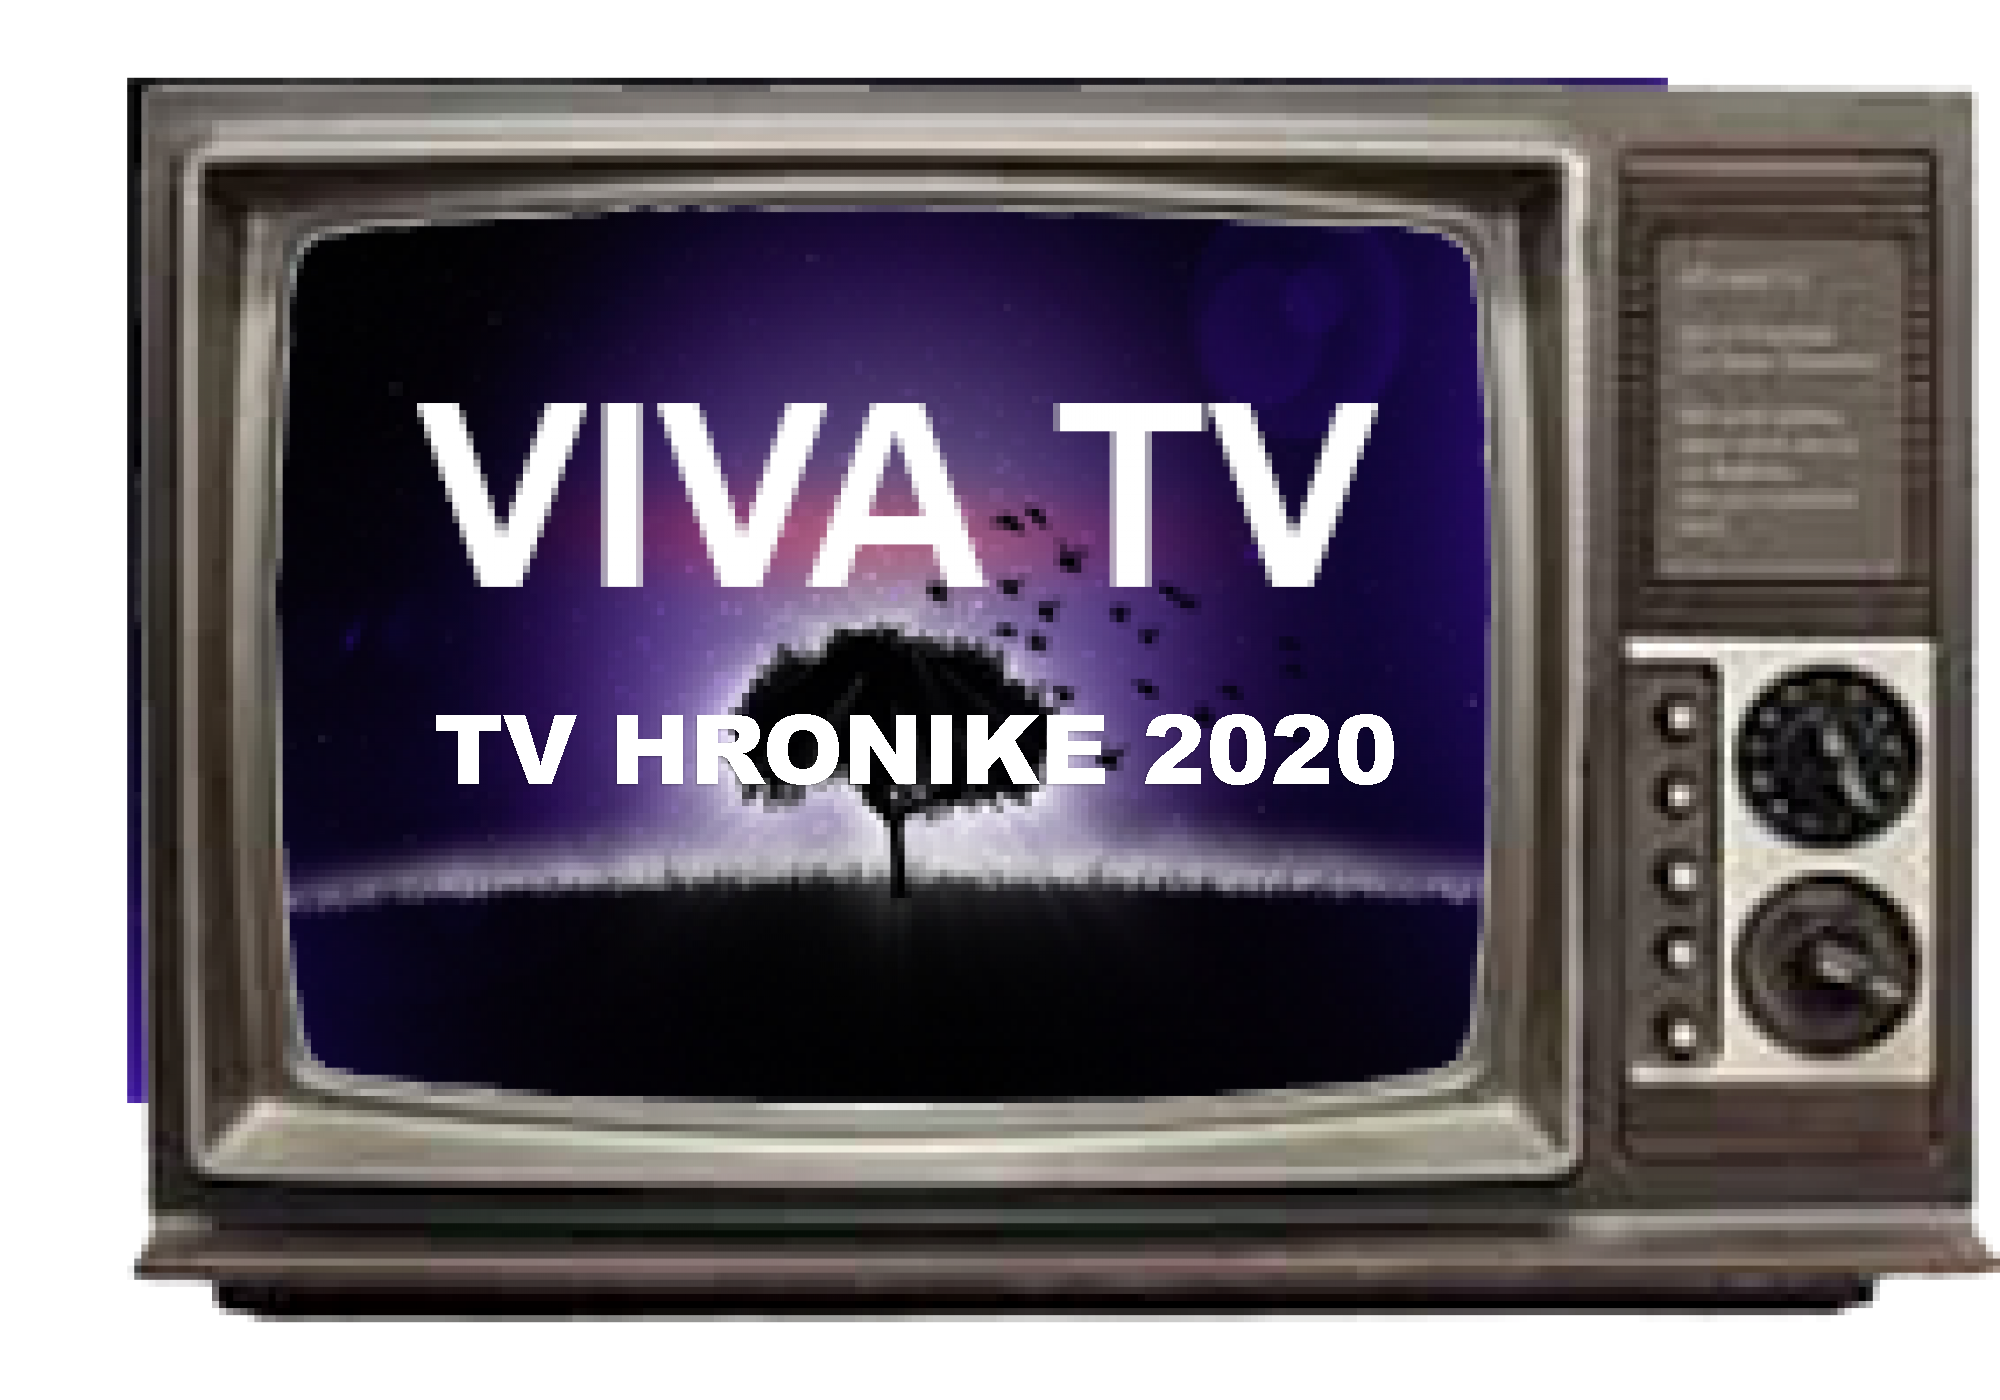 HRONIKE 2020